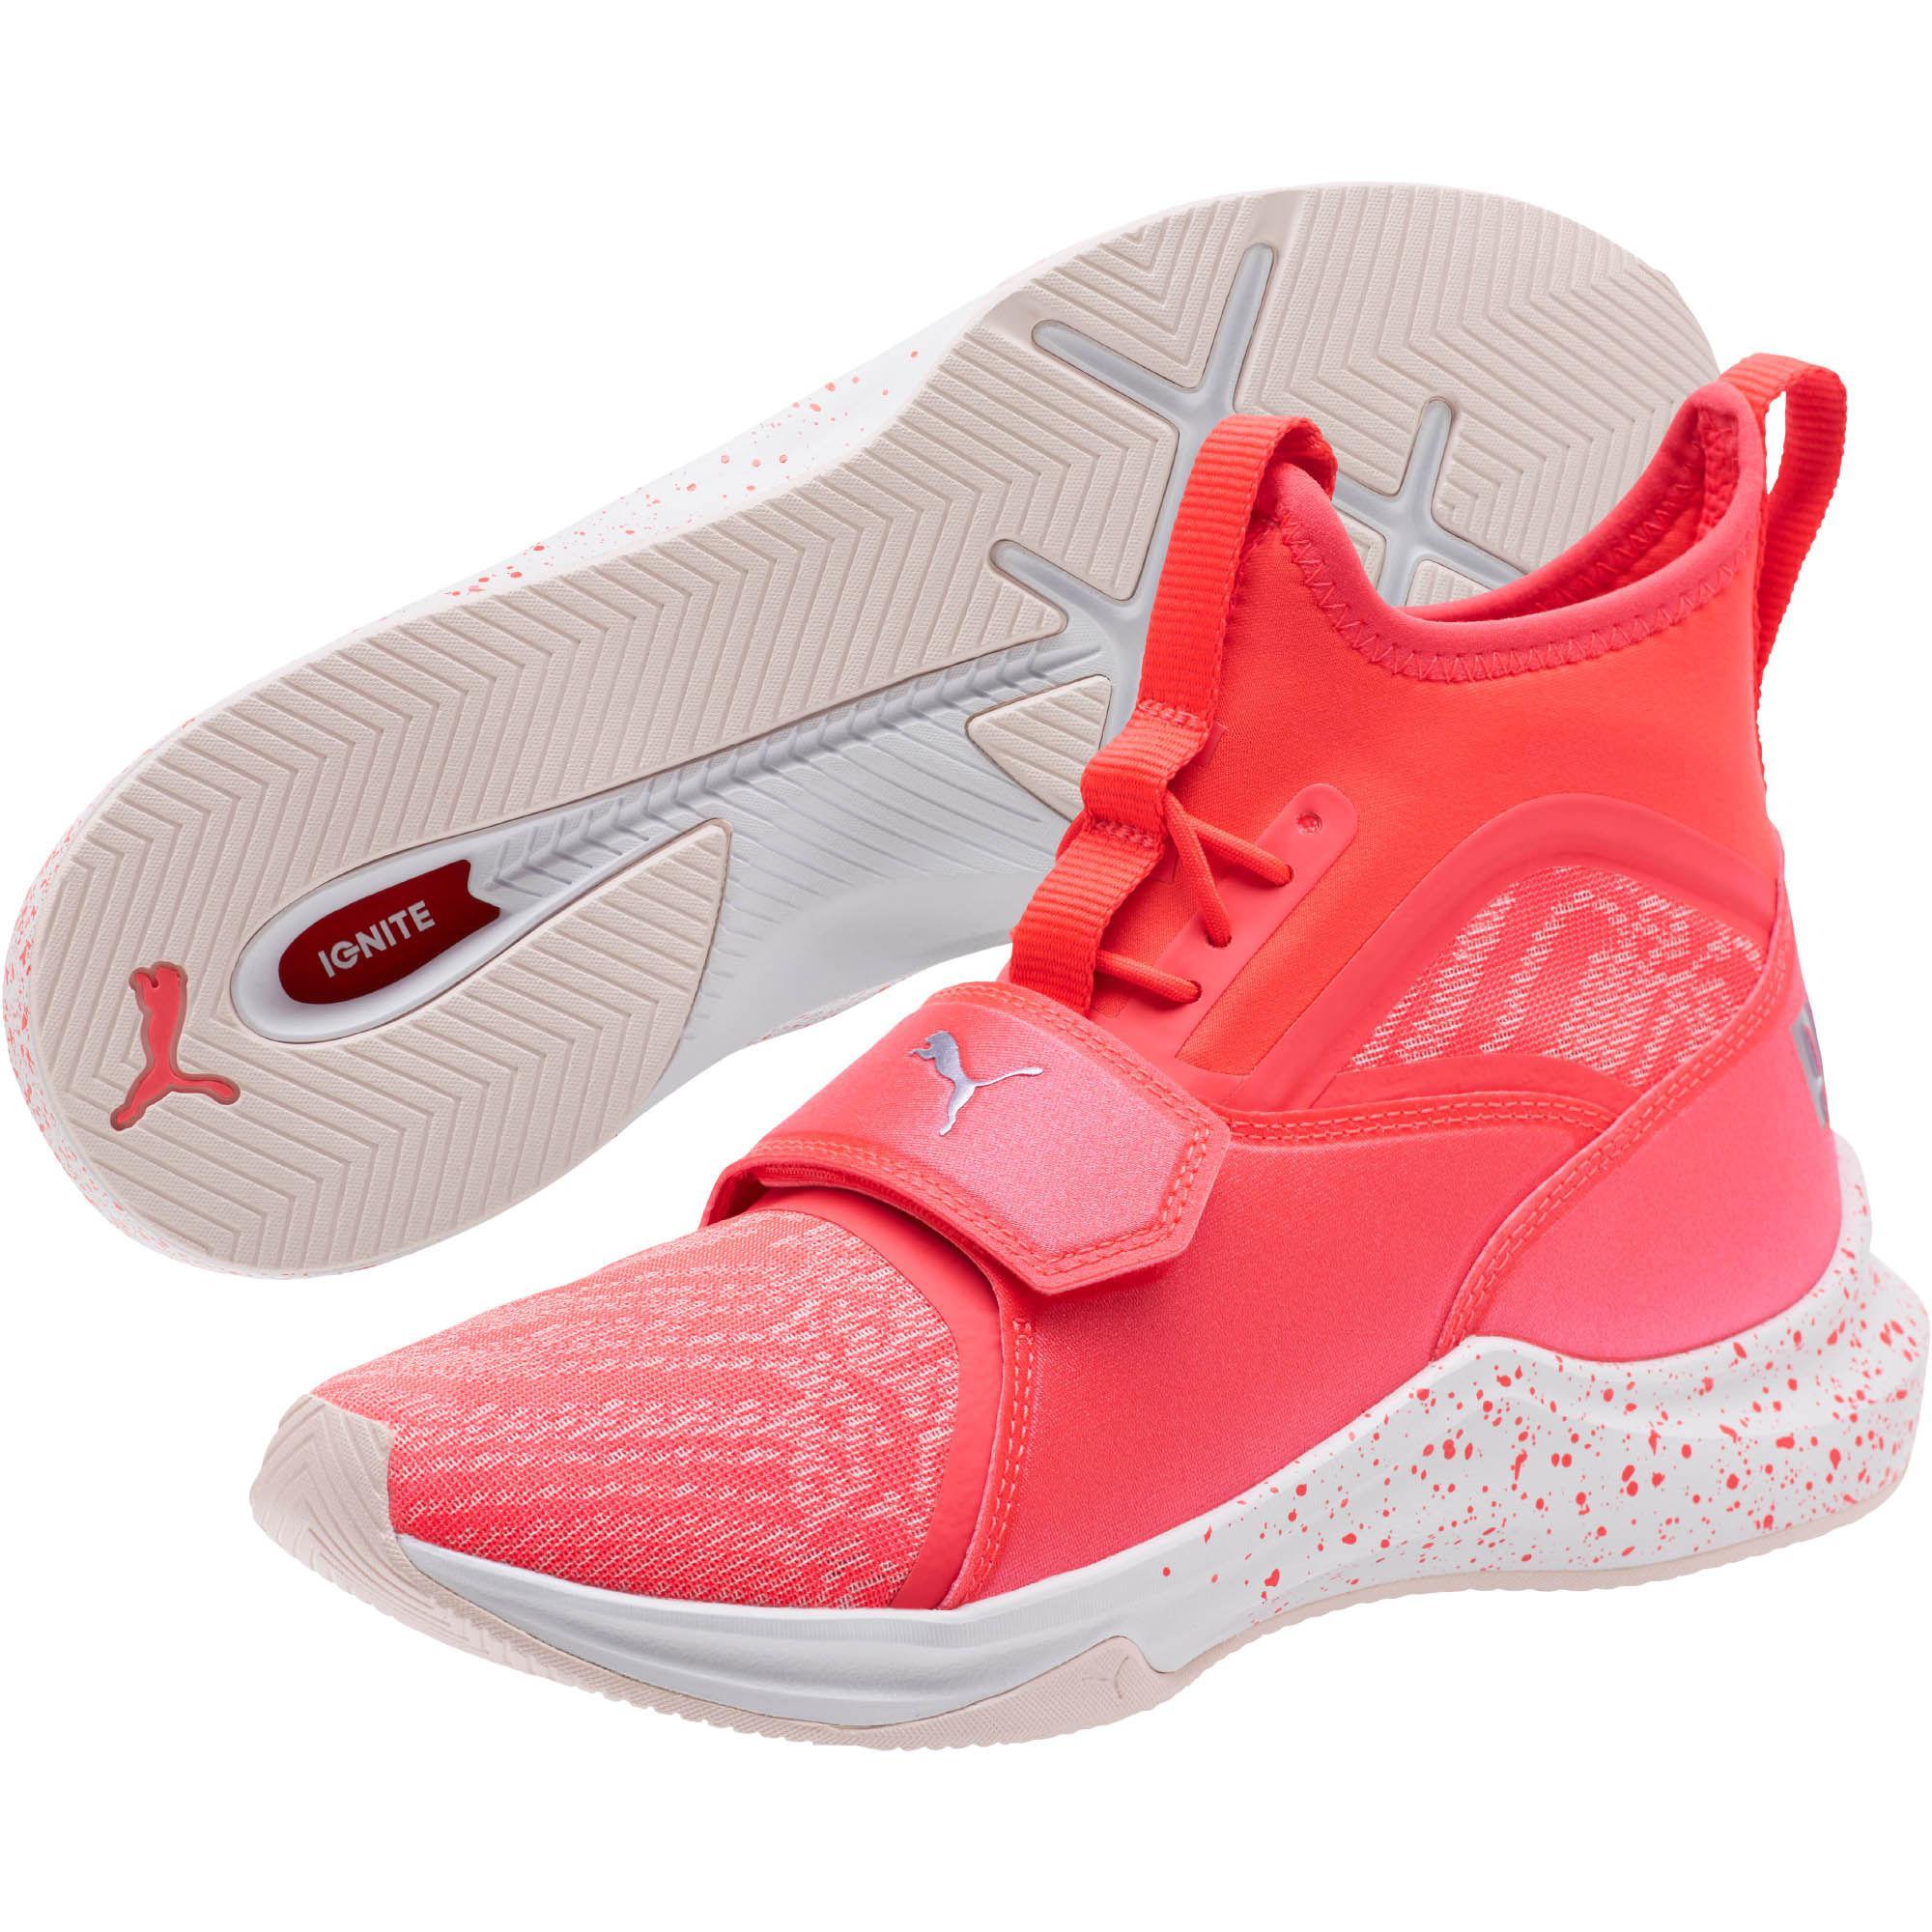 Lyst - PUMA Phenom Oceannaire Women s Training Shoes 579e78195